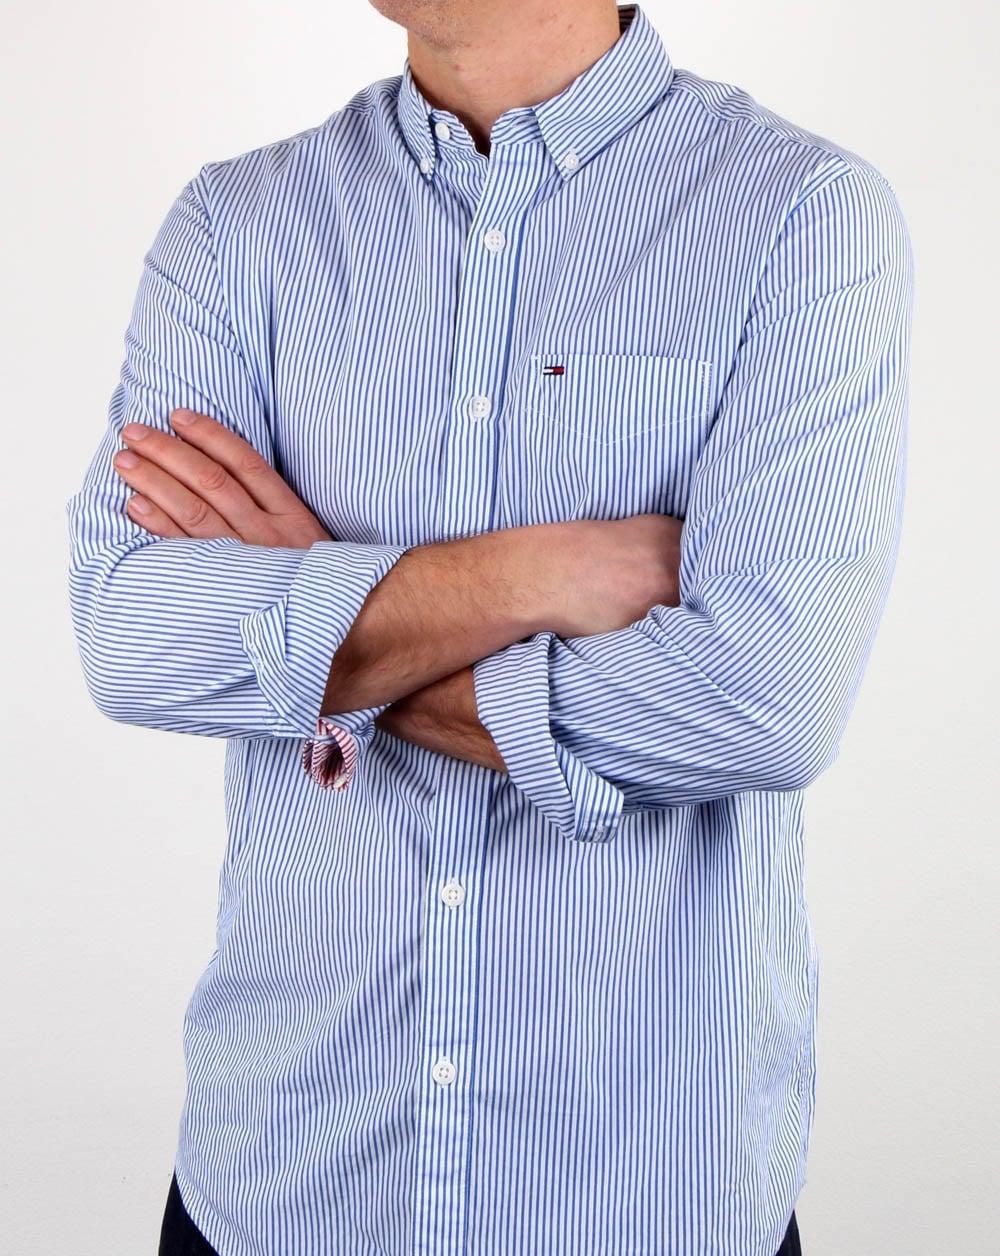 Tommy hilfiger classic stripe shirt white blue mens for Tommy hilfiger fitzgerald striped shirt